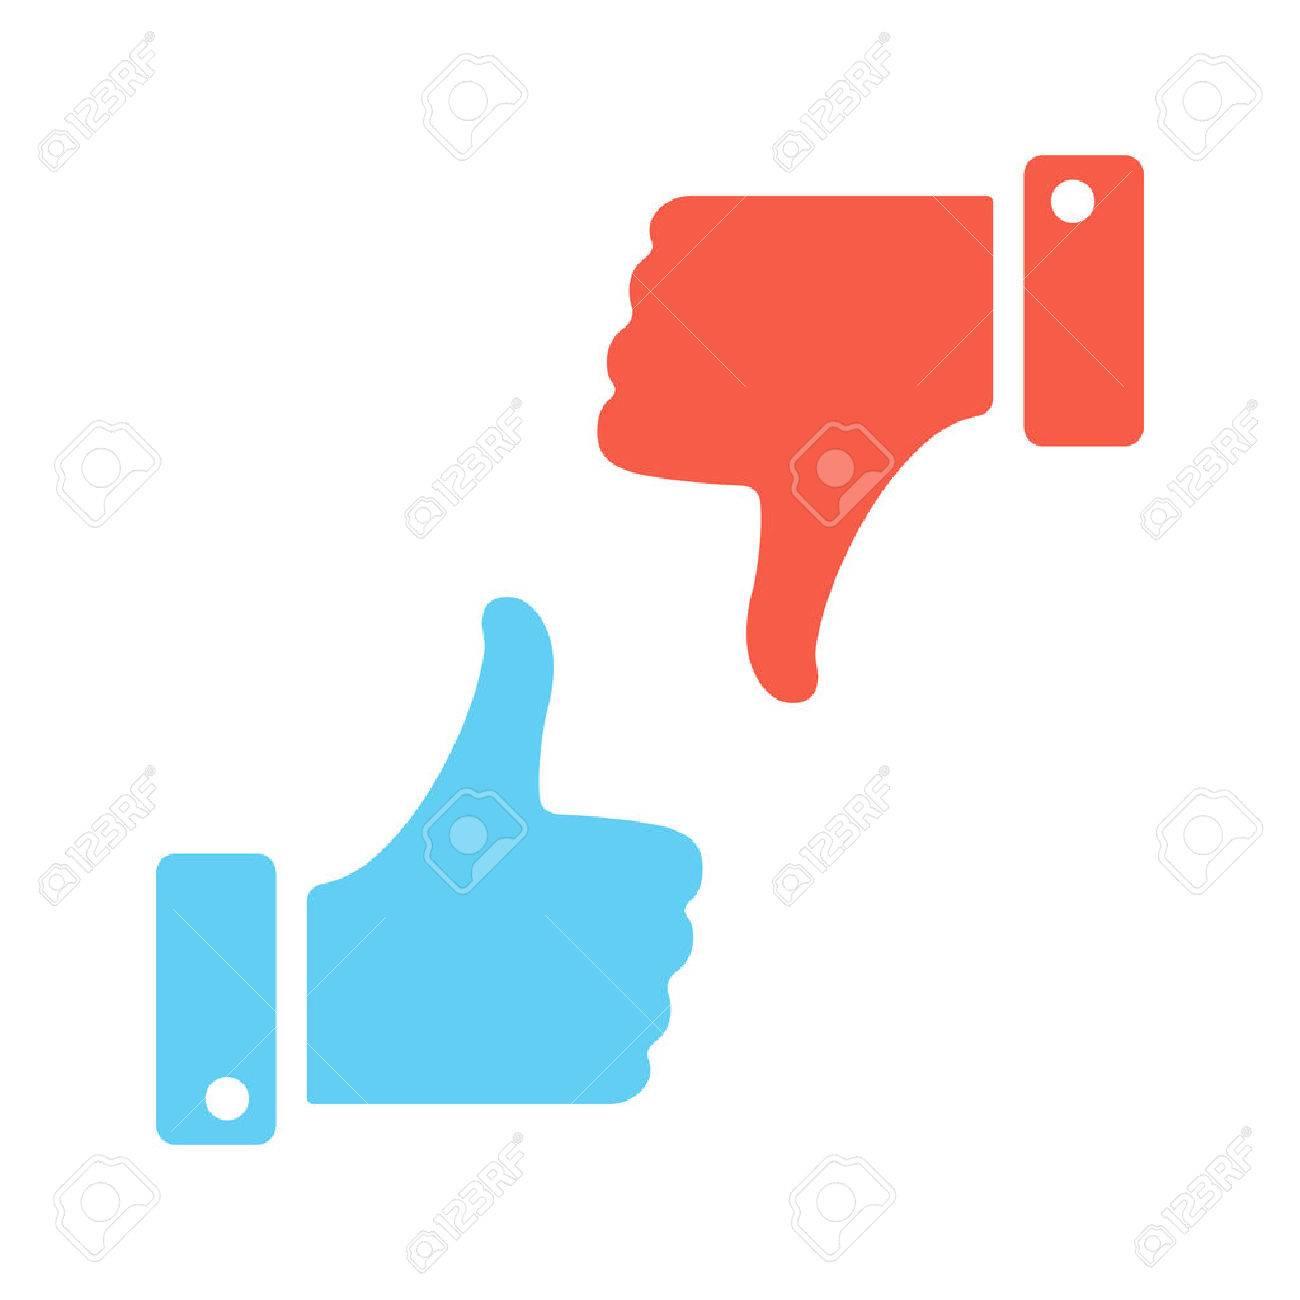 Blue like red dislike. Vector icons - 50915936